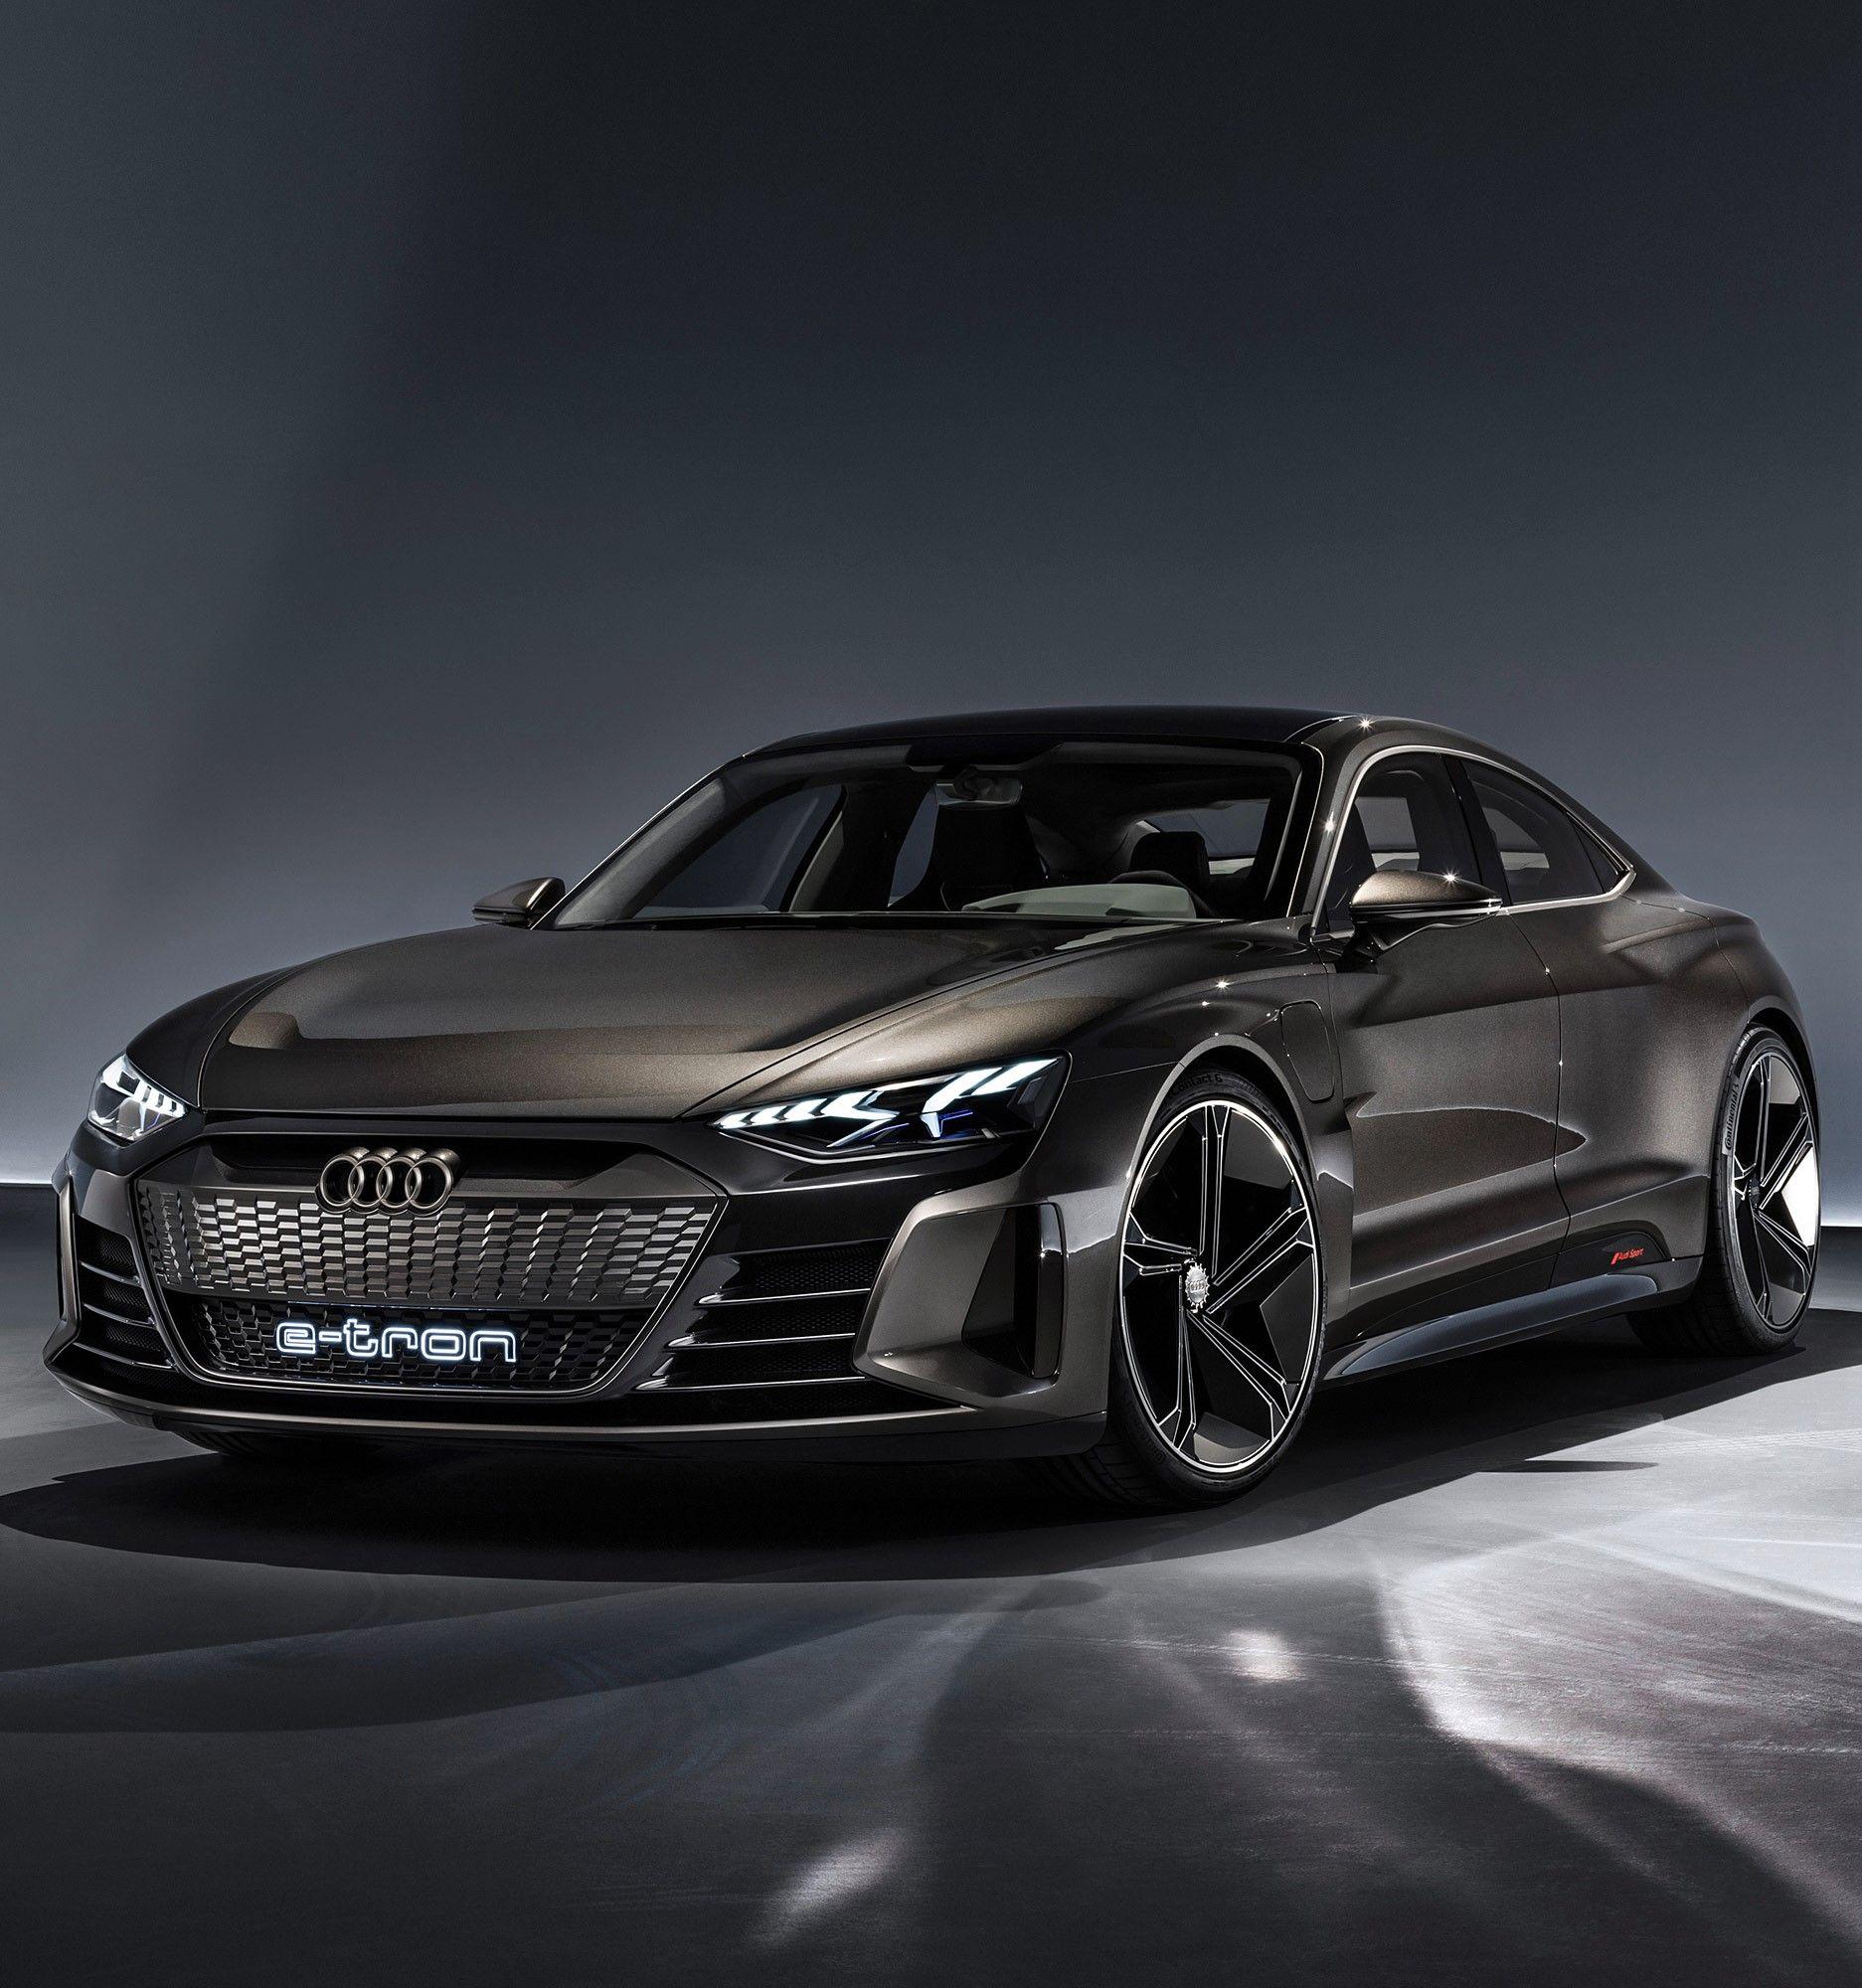 2018 Audi E Tron Gt Concept The Man Audi Audi Gt Audi Cars